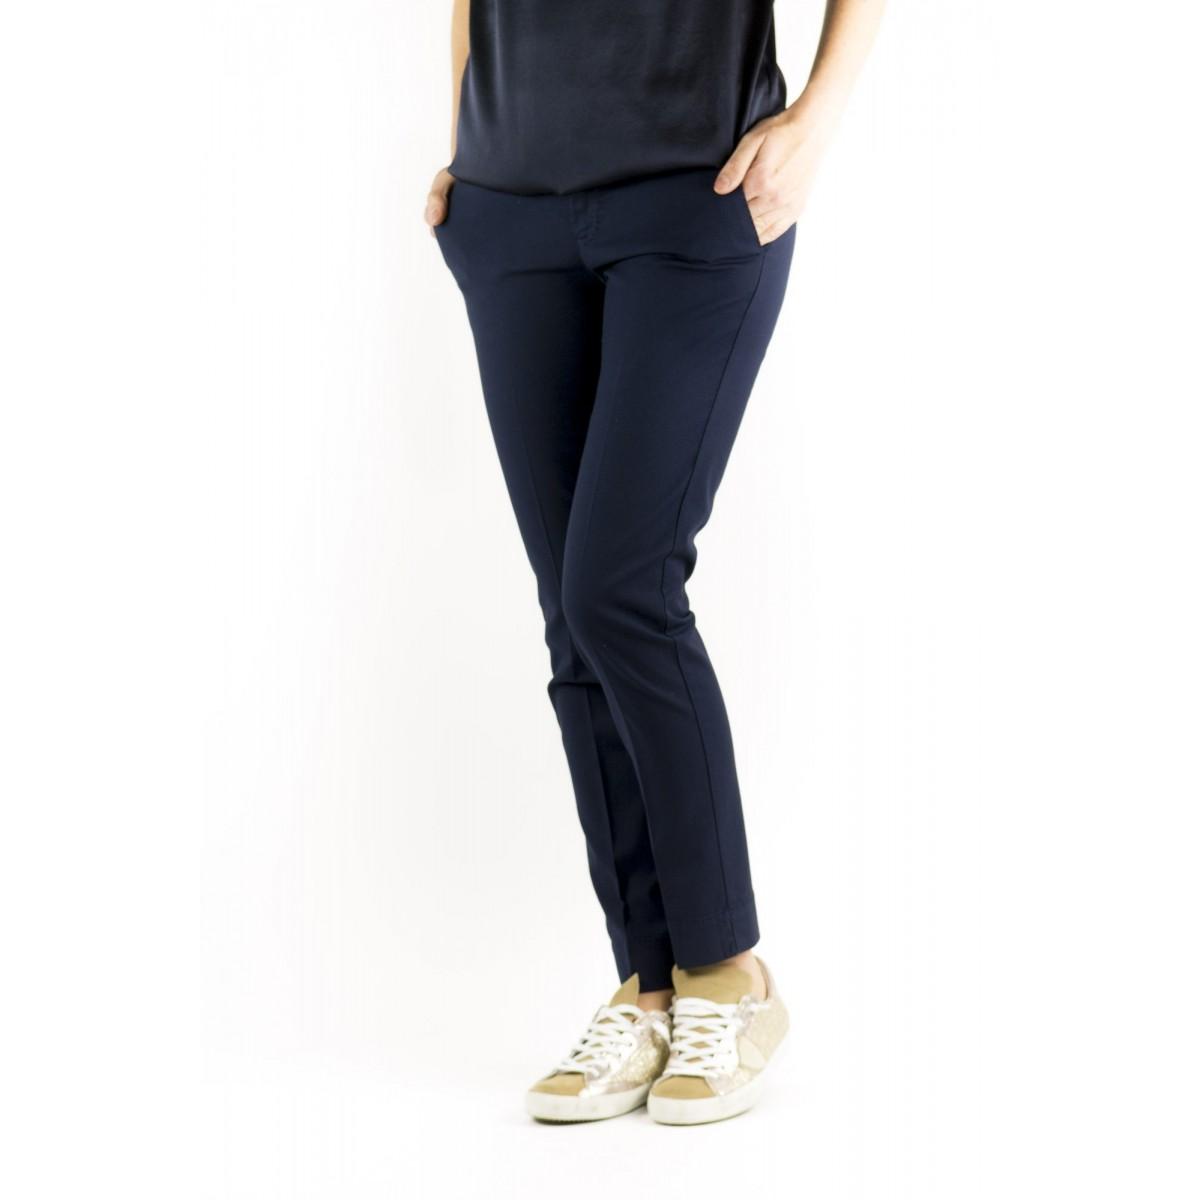 Pantalone donna Pt0w - Vtny ts63 piquet cotone strech 0350 - blu